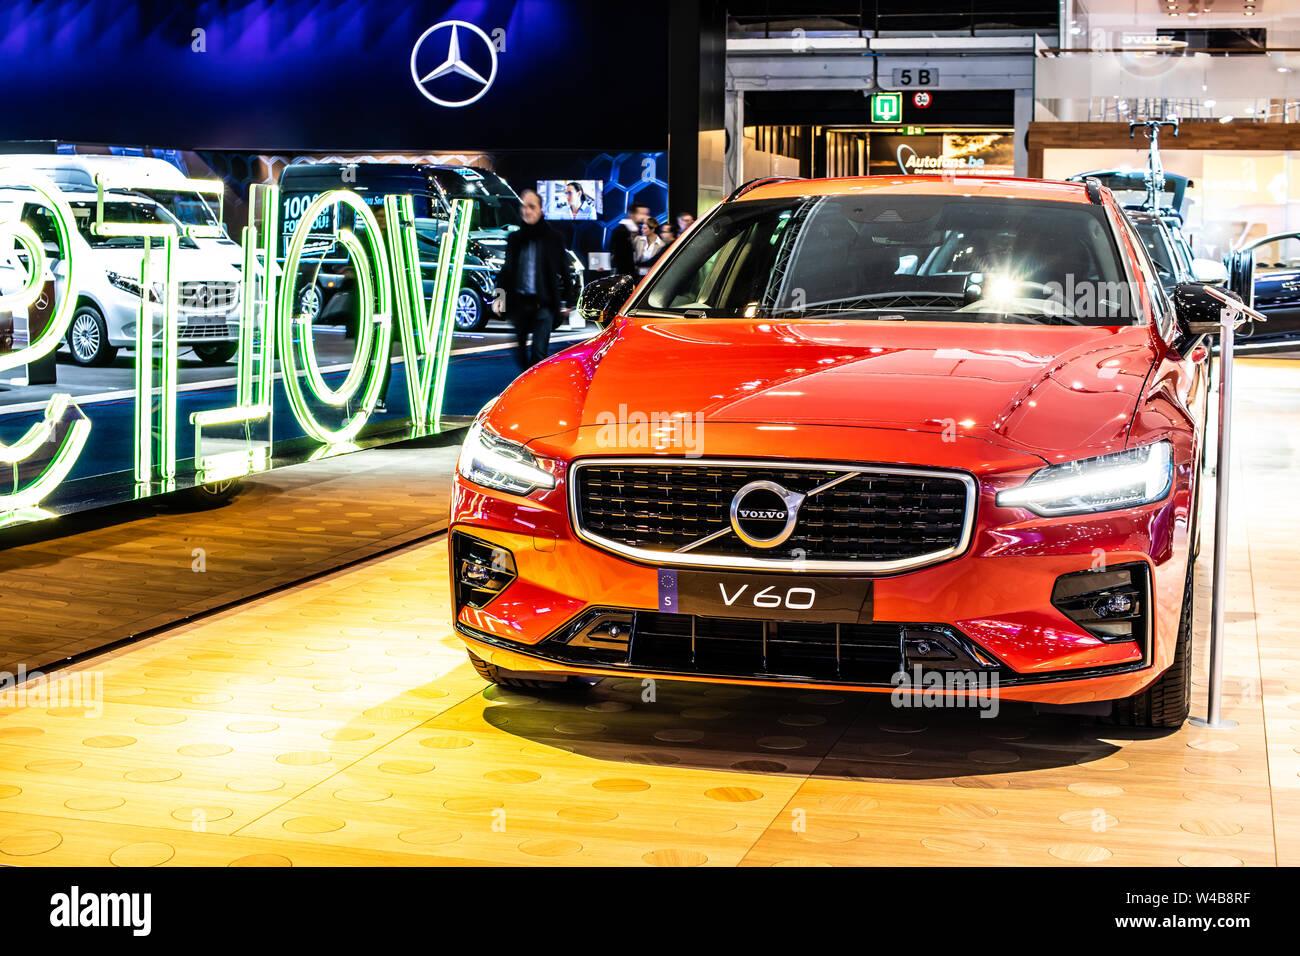 Brussels Belgium Jan 2019 Red Volvo V60 Station Wagon